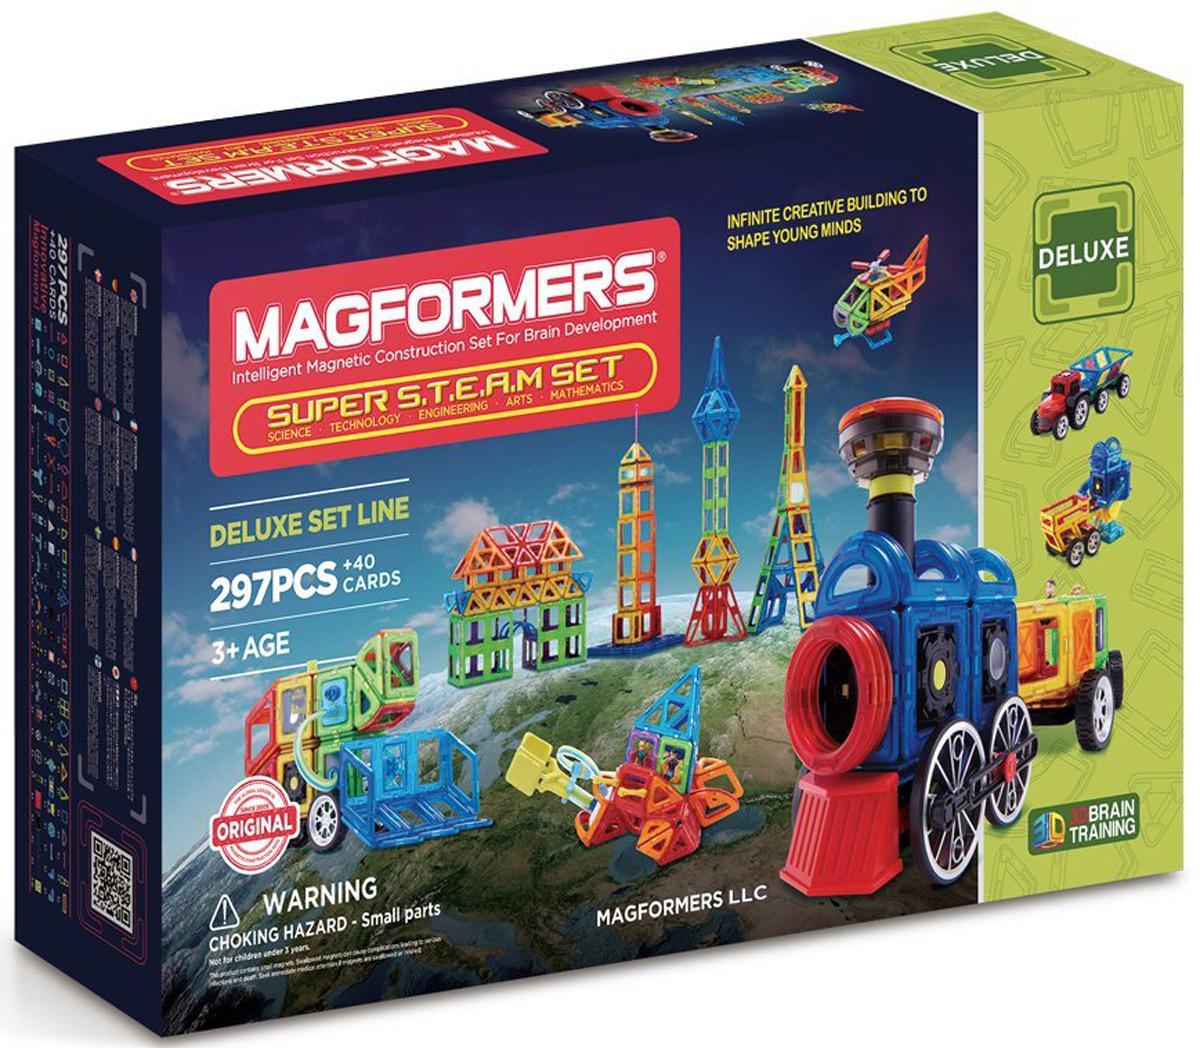 Magformers Конструктор Super Steam Set ubtech робот конструктор jimu inventor